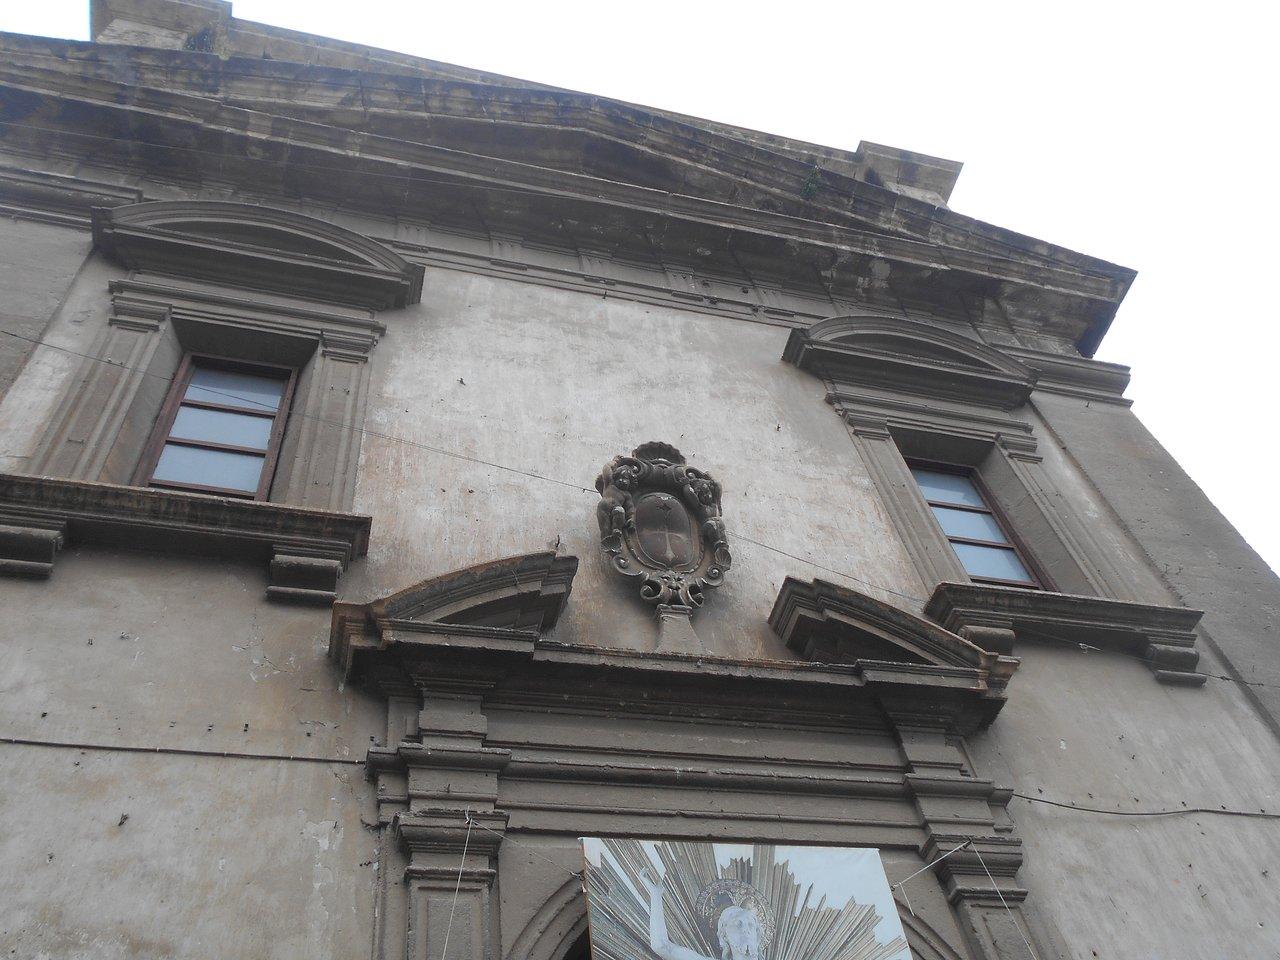 Chiesa di San Ranieri e dei Santi Quaranta Martiri Pisani